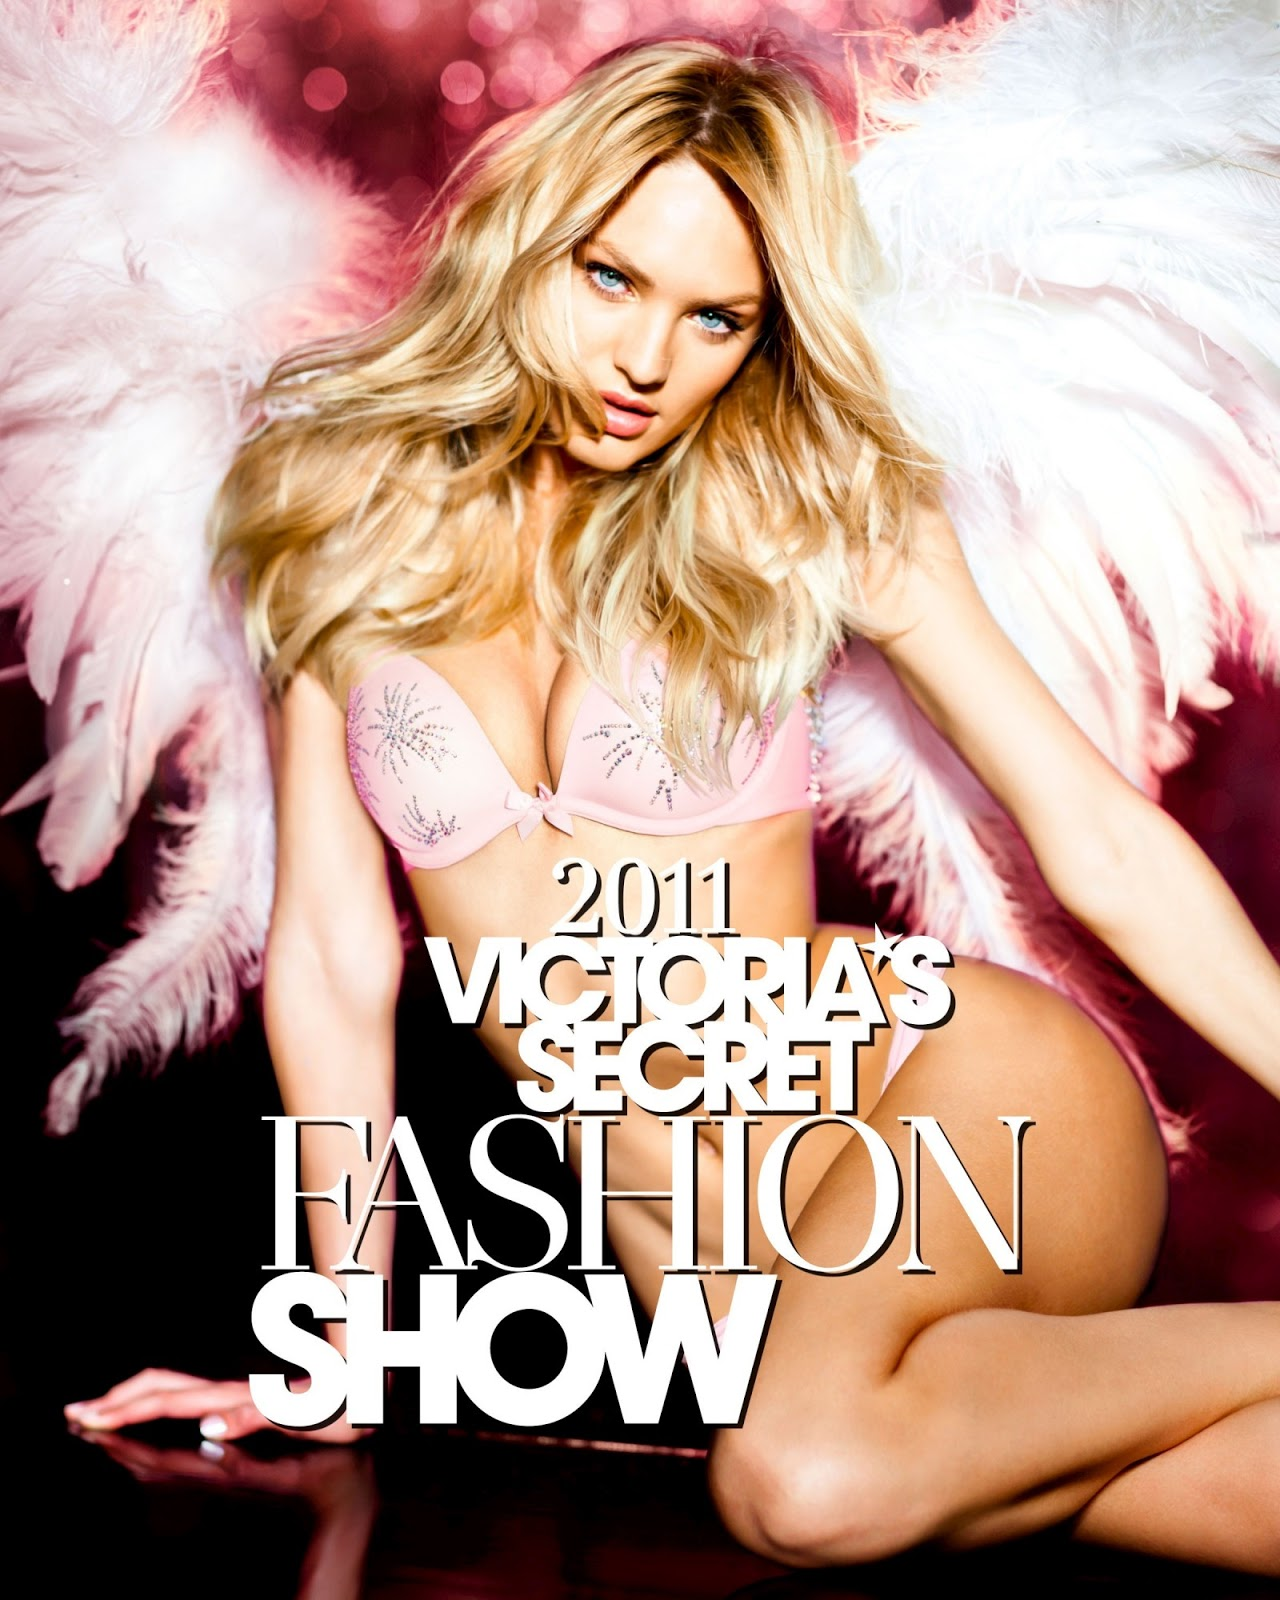 http://2.bp.blogspot.com/-tFCY3HCOeHM/ULDmxq0FjwI/AAAAAAAAAMo/XziBiLcFN-4/s1600/Candice_Swanepoel__2011_Victorias_Secret_Fashion_Show_Promo.jpg